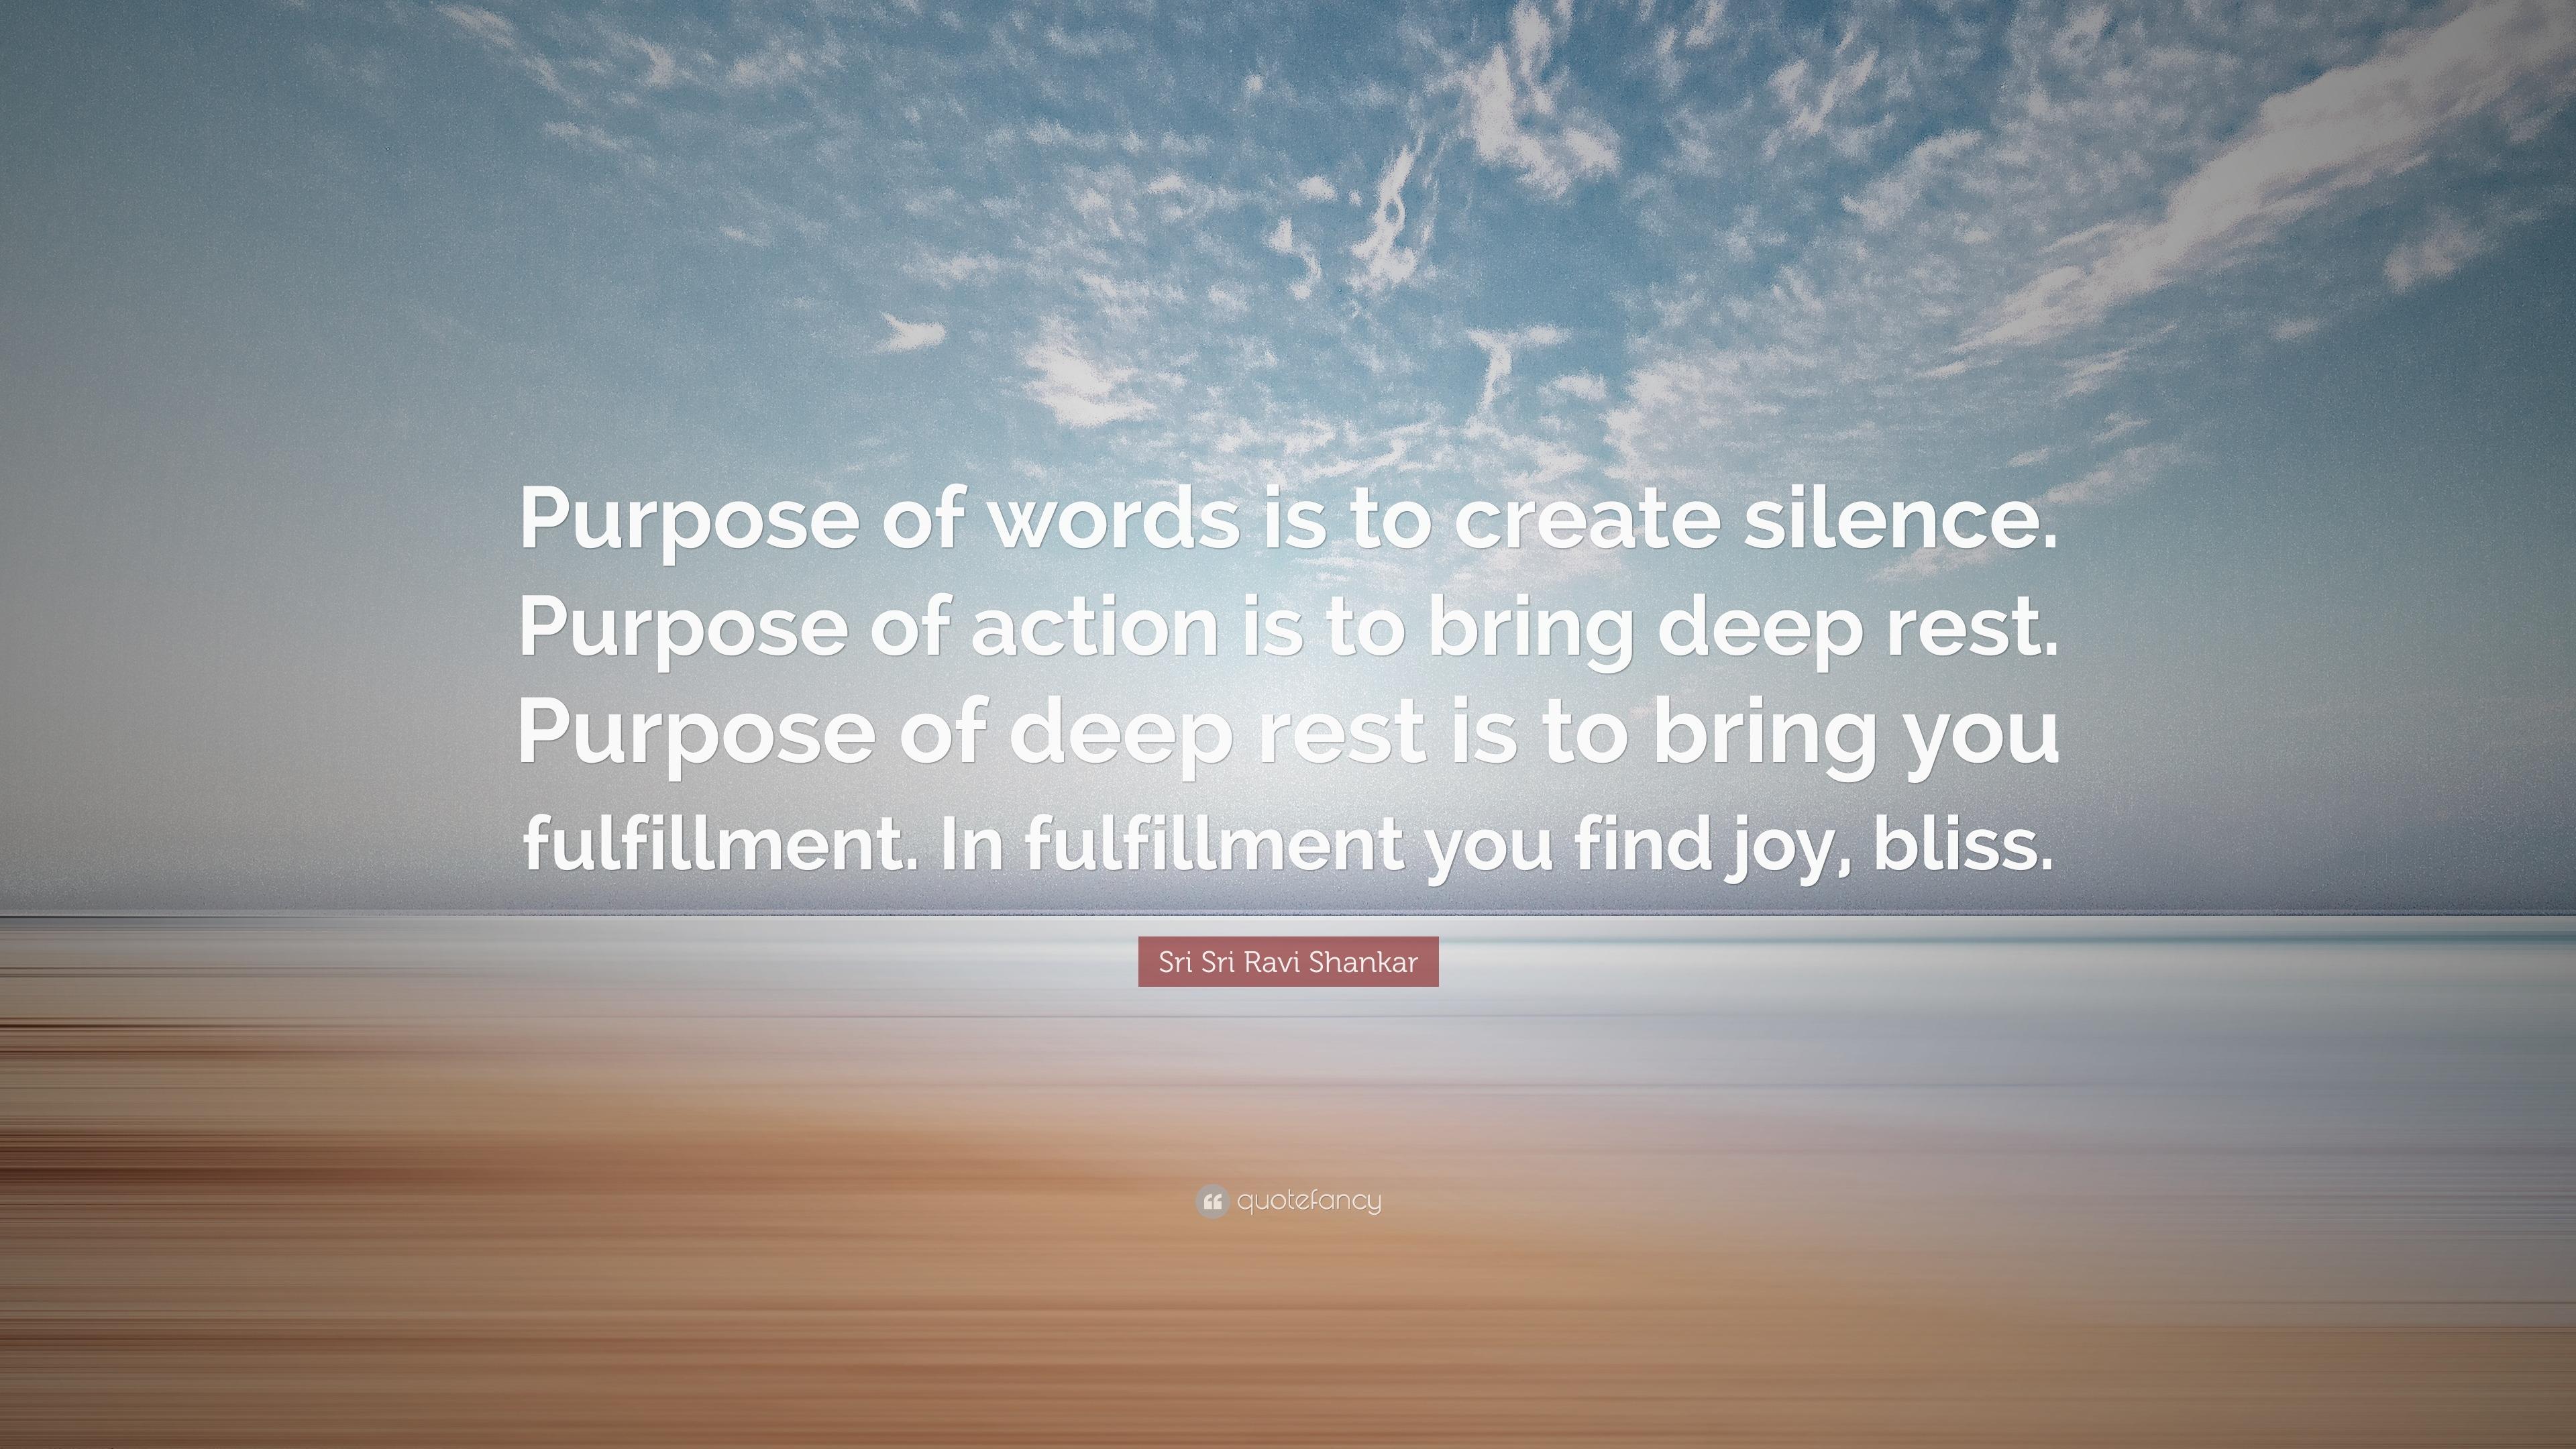 Sri Sri Ravi Shankar Quote Purpose Of Words Is To Create Silence